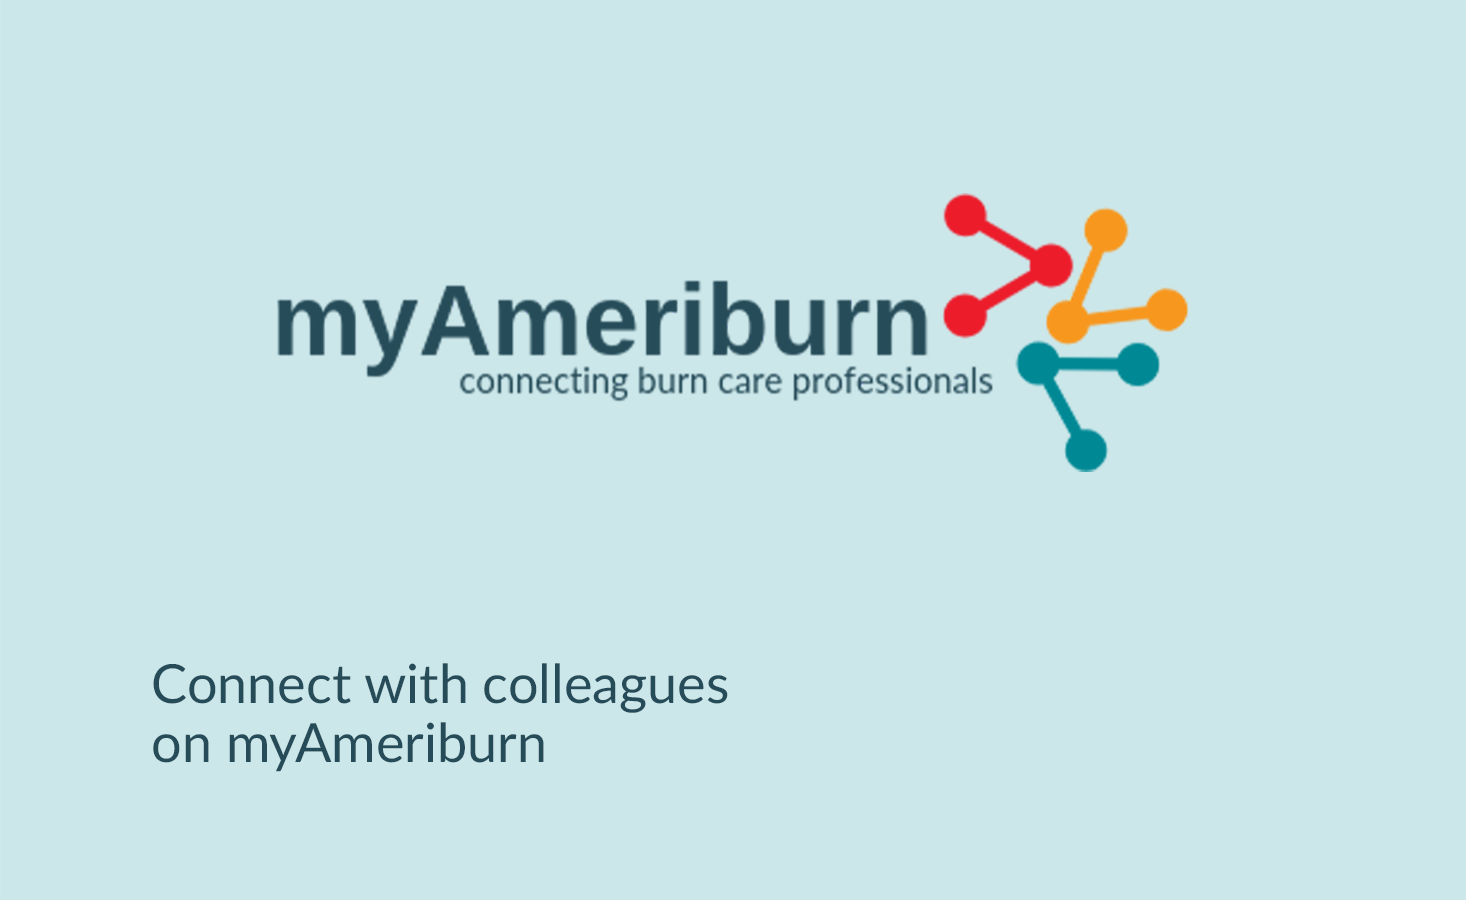 myAmeriburn: Connecting burn care professionals